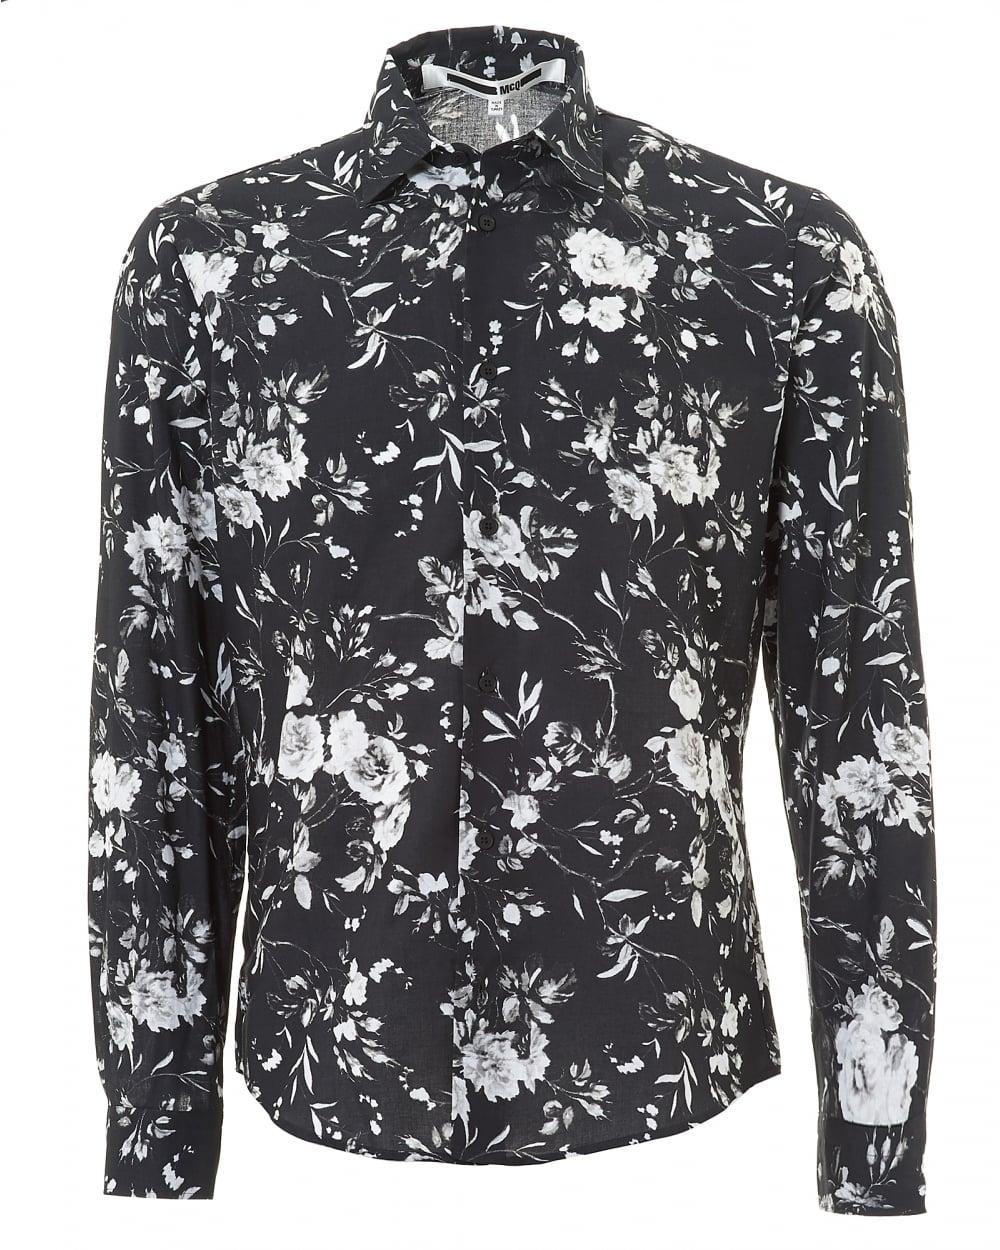 Mcq by alexander mcqueen mens all over floral greyscale for Alexander mcqueen shirt men